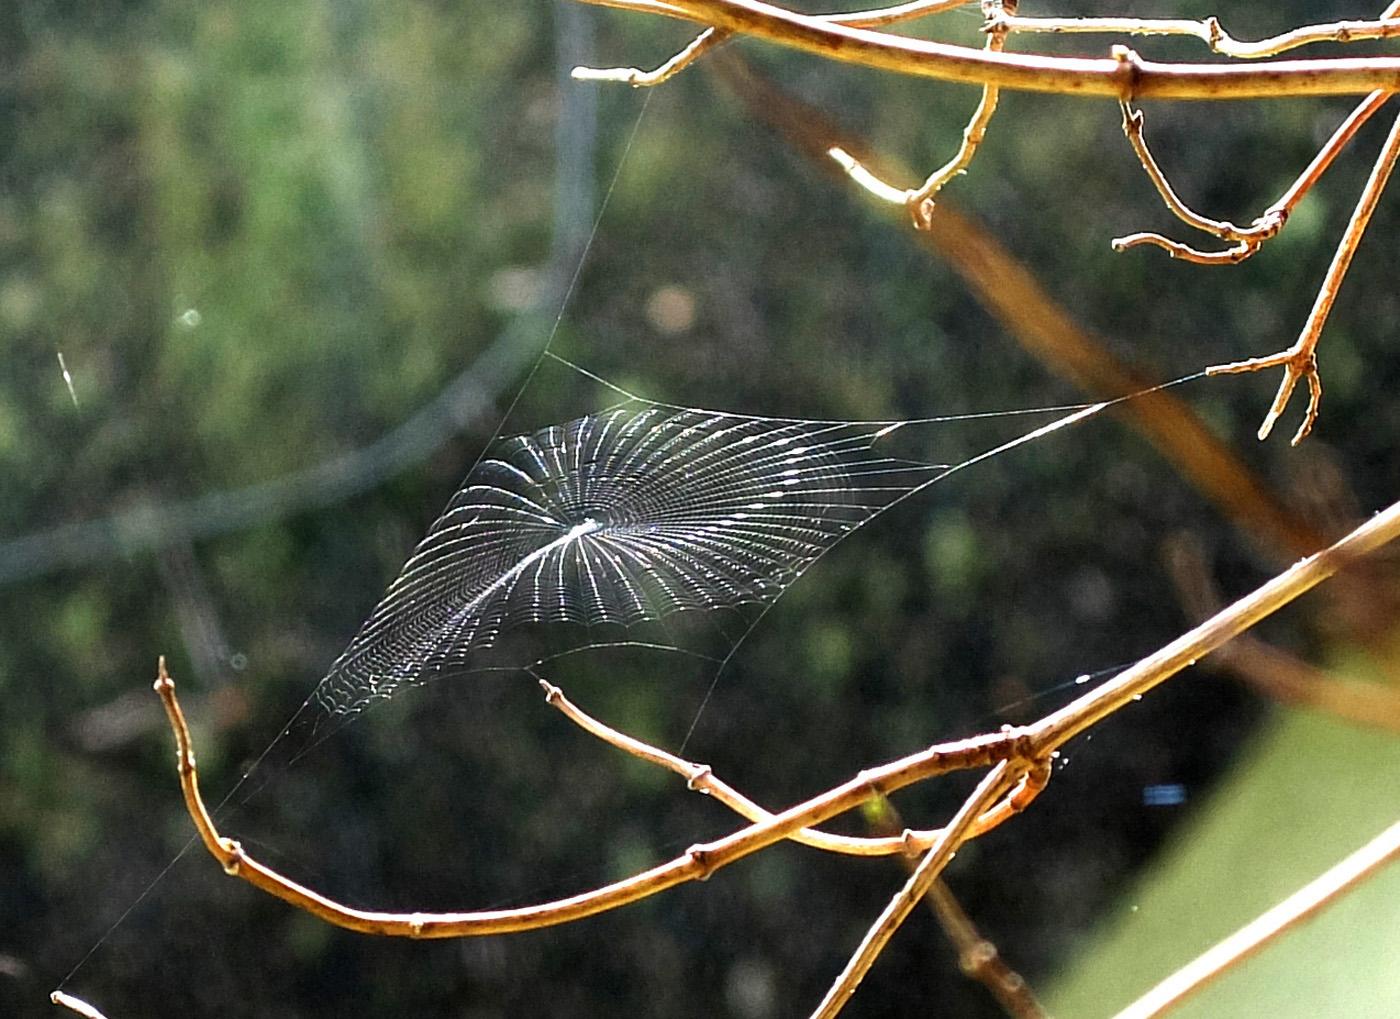 61_Nature's Geometric Precision_Michael Hillier